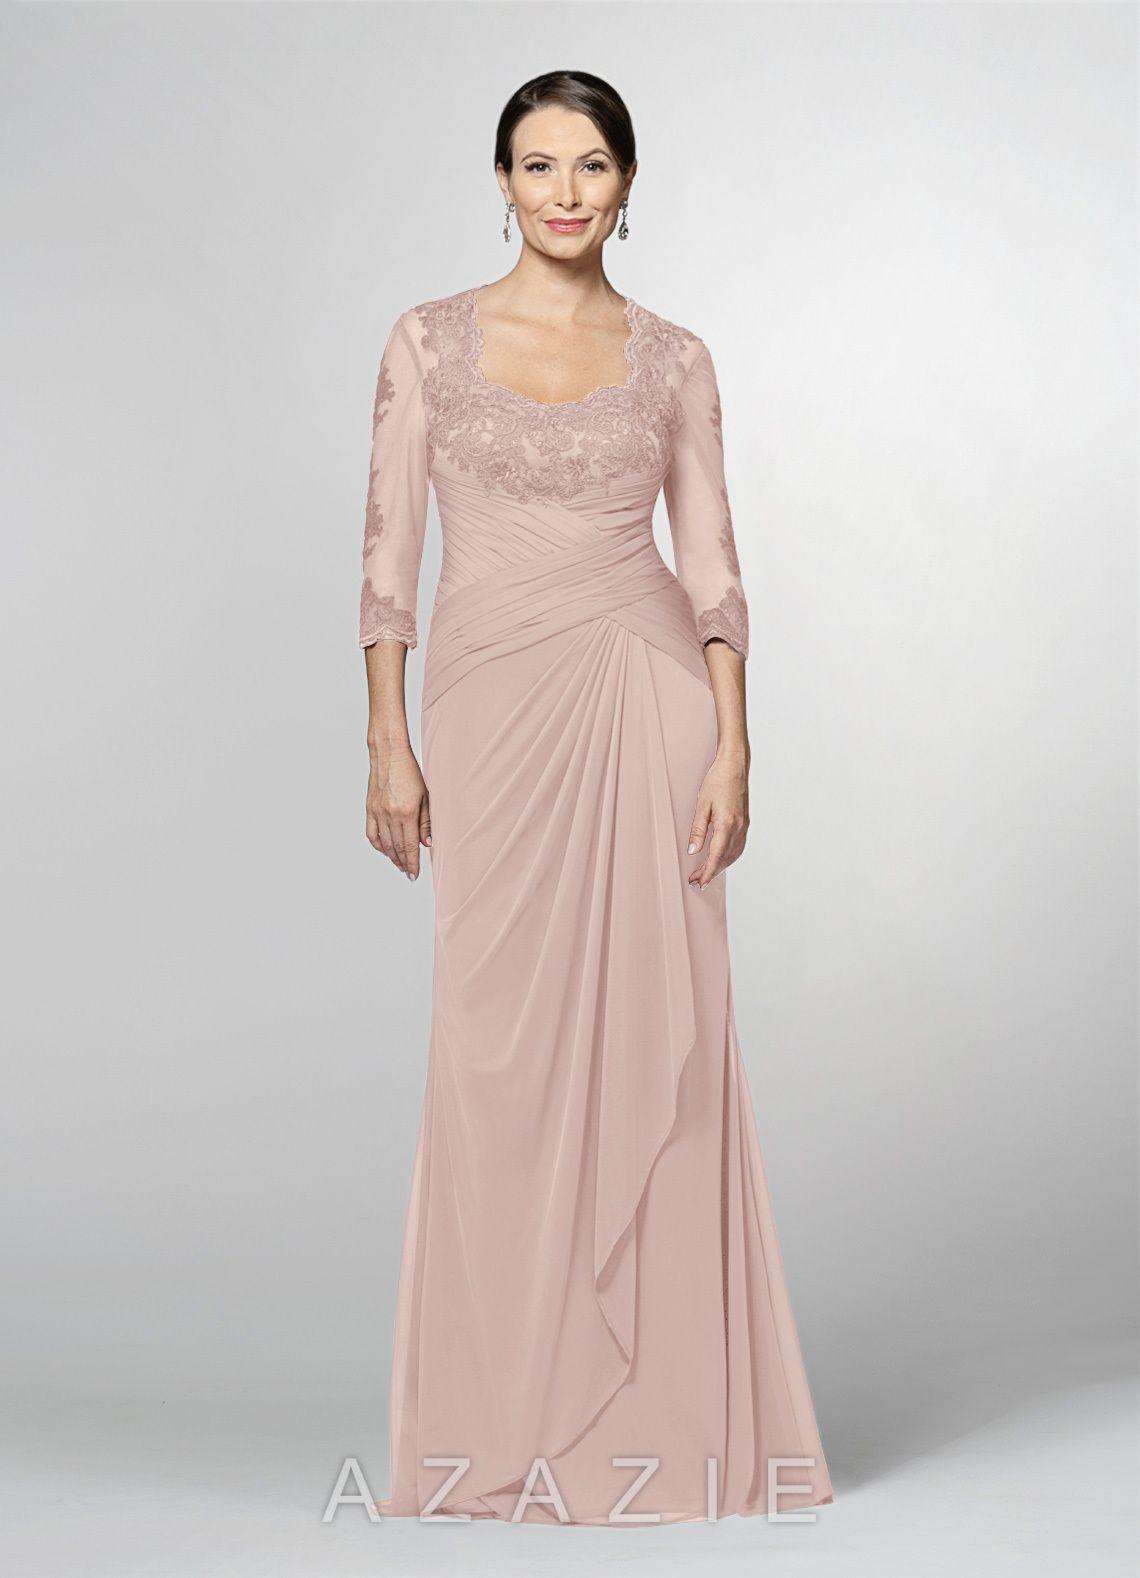 ea47b847ed422 Azazie Camilla MBD Mother Of The Bride Dress - Grape | Azazie